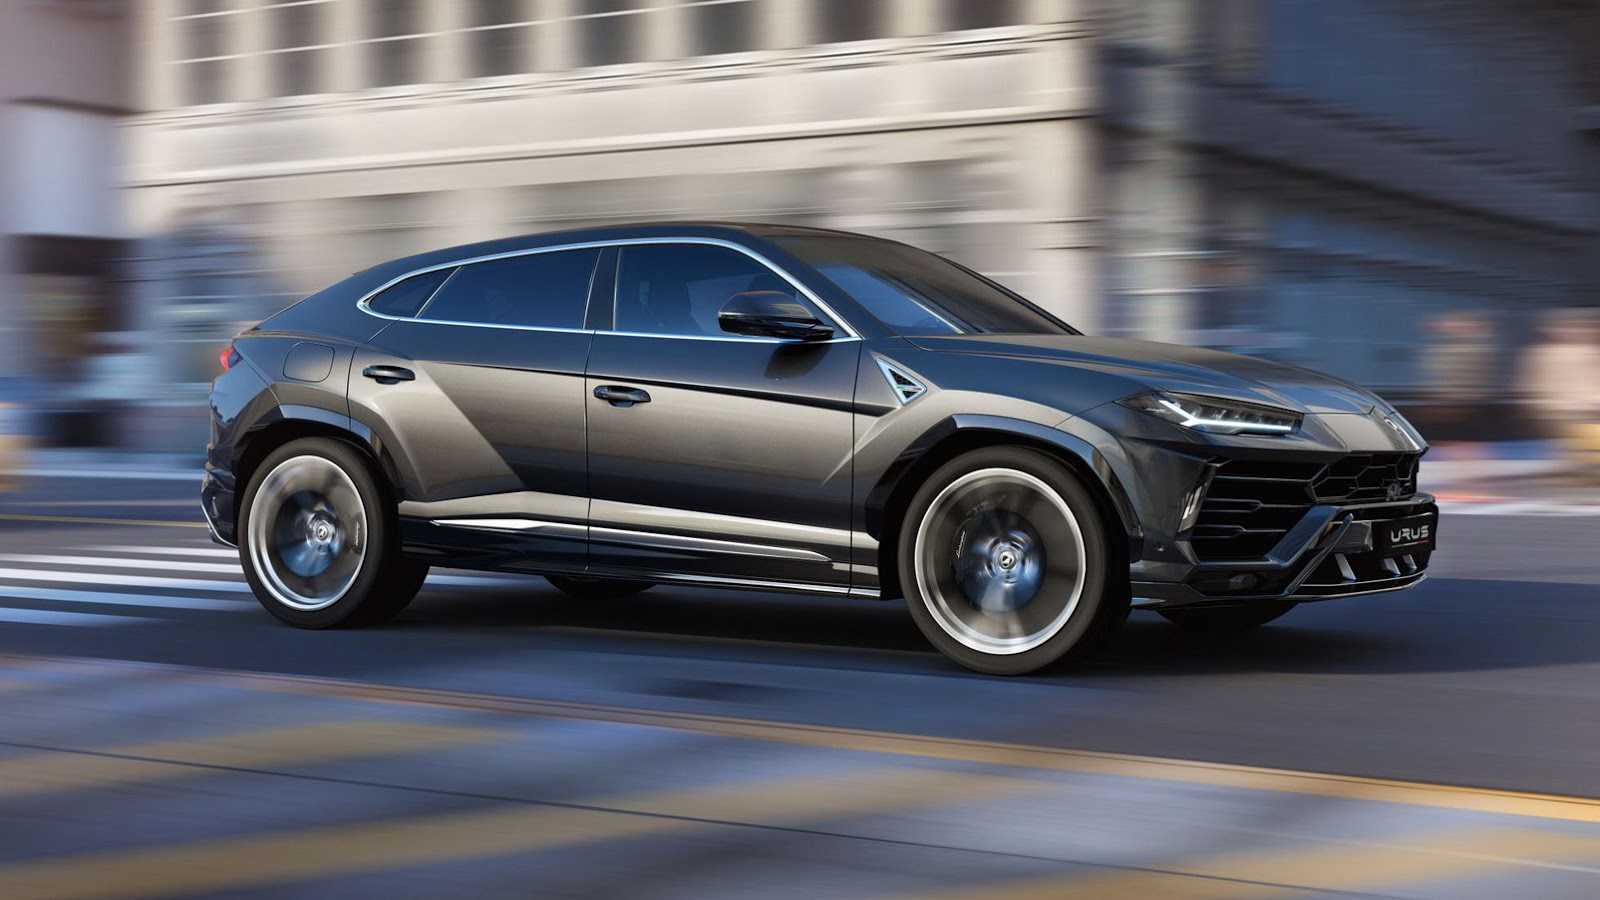 Lamborghini_Urus_tinhte_2.jpg